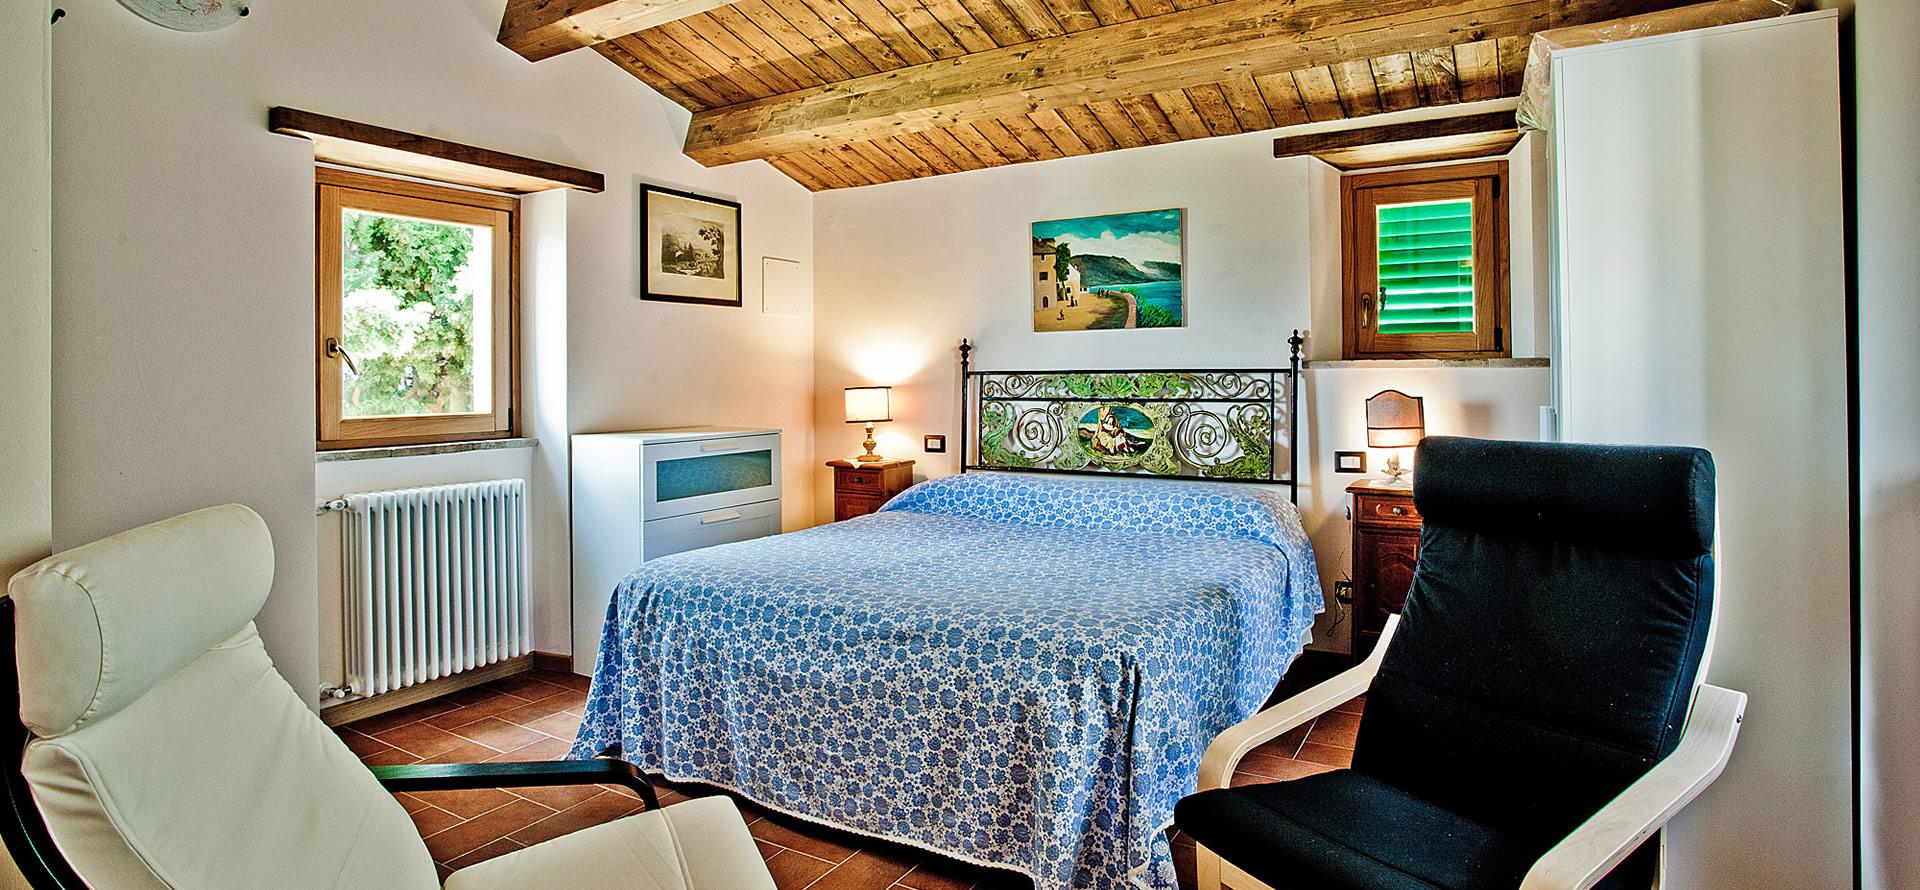 Camera appartamento Olivo in Toscana